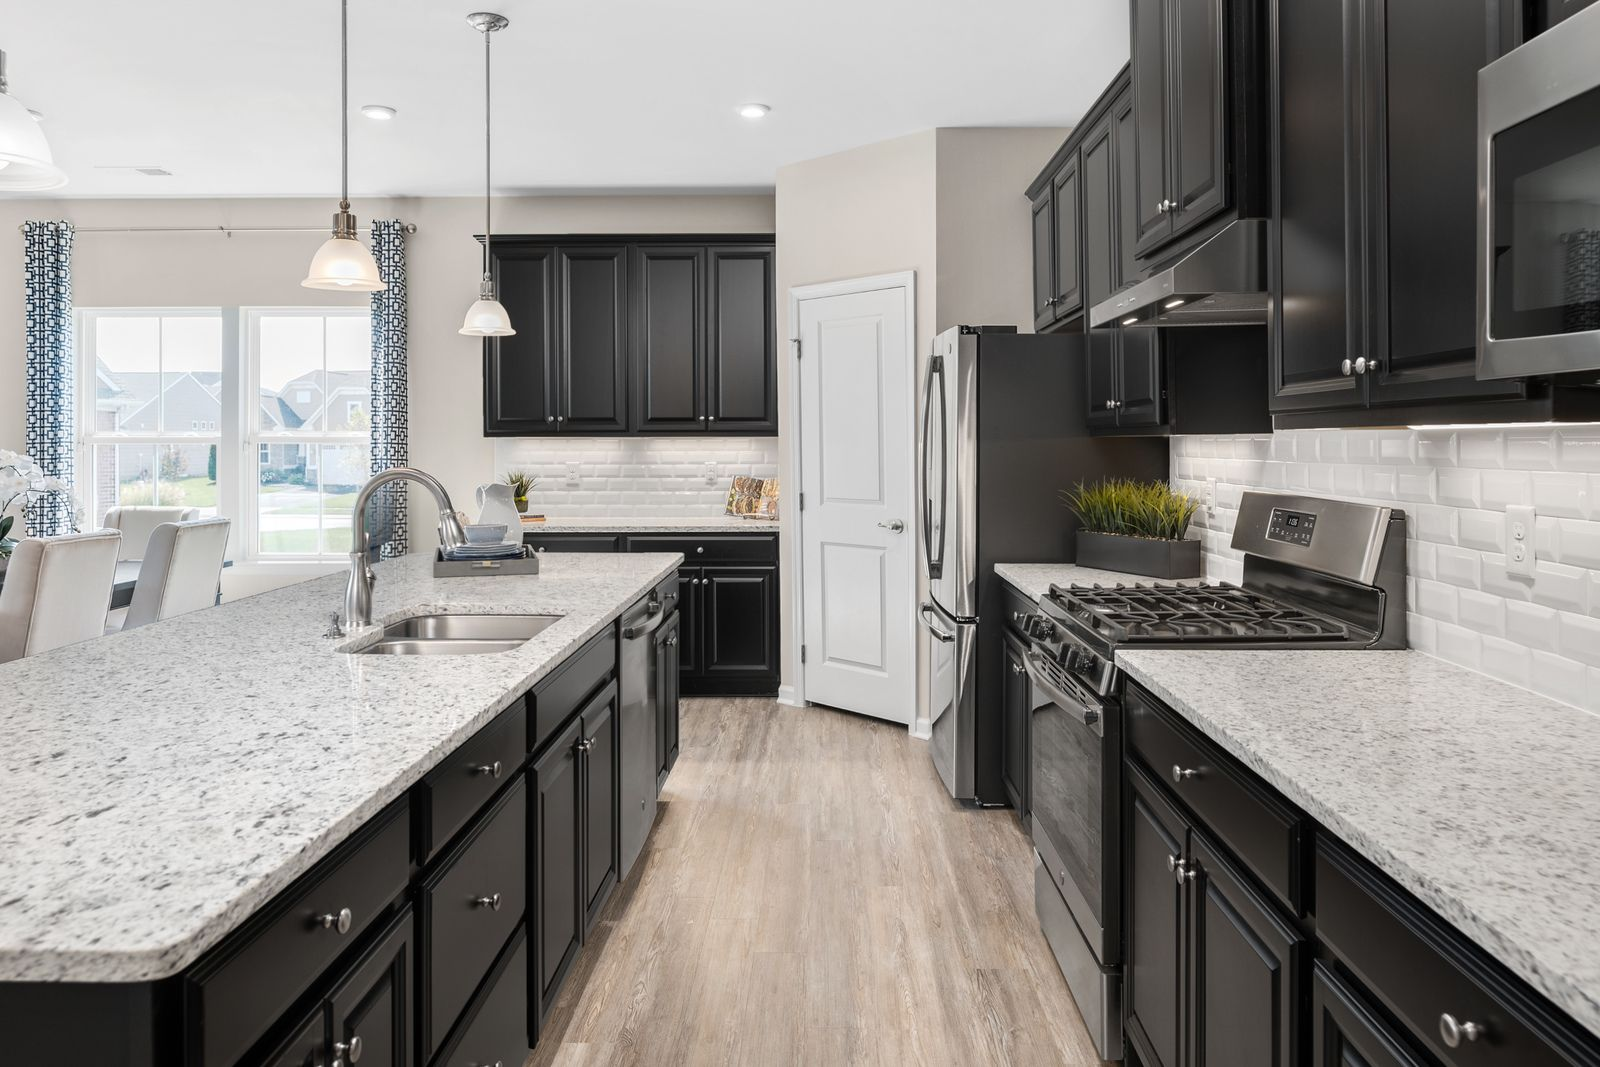 Kitchen featured in the Palladio Ranch By Ryan Homes in Greenville-Spartanburg, SC